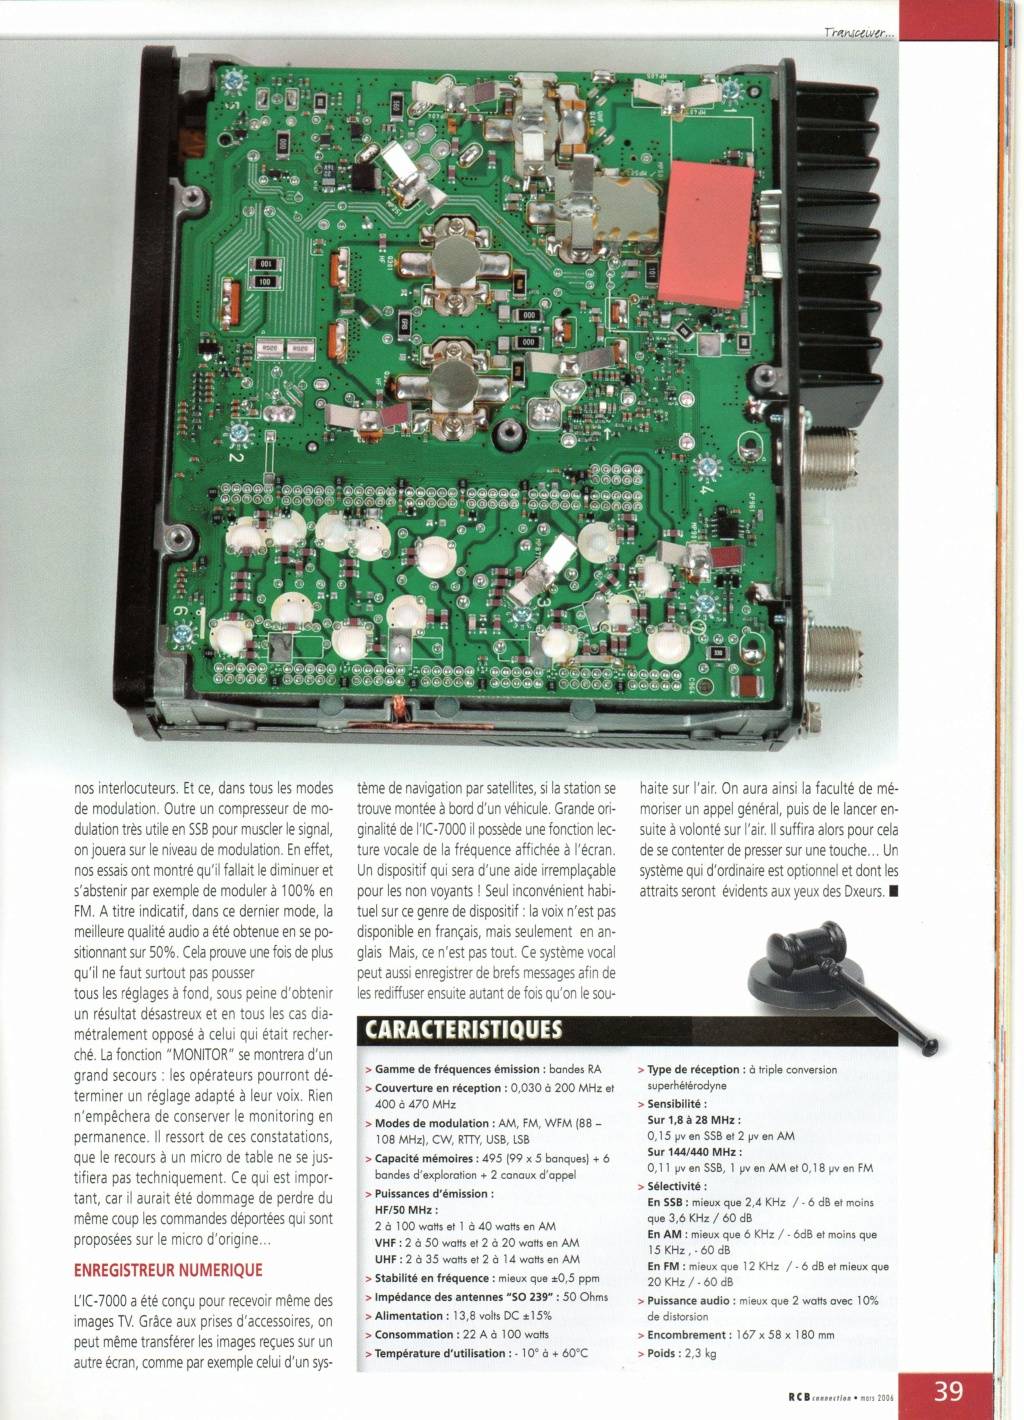 Icom IC-7000 Chora473